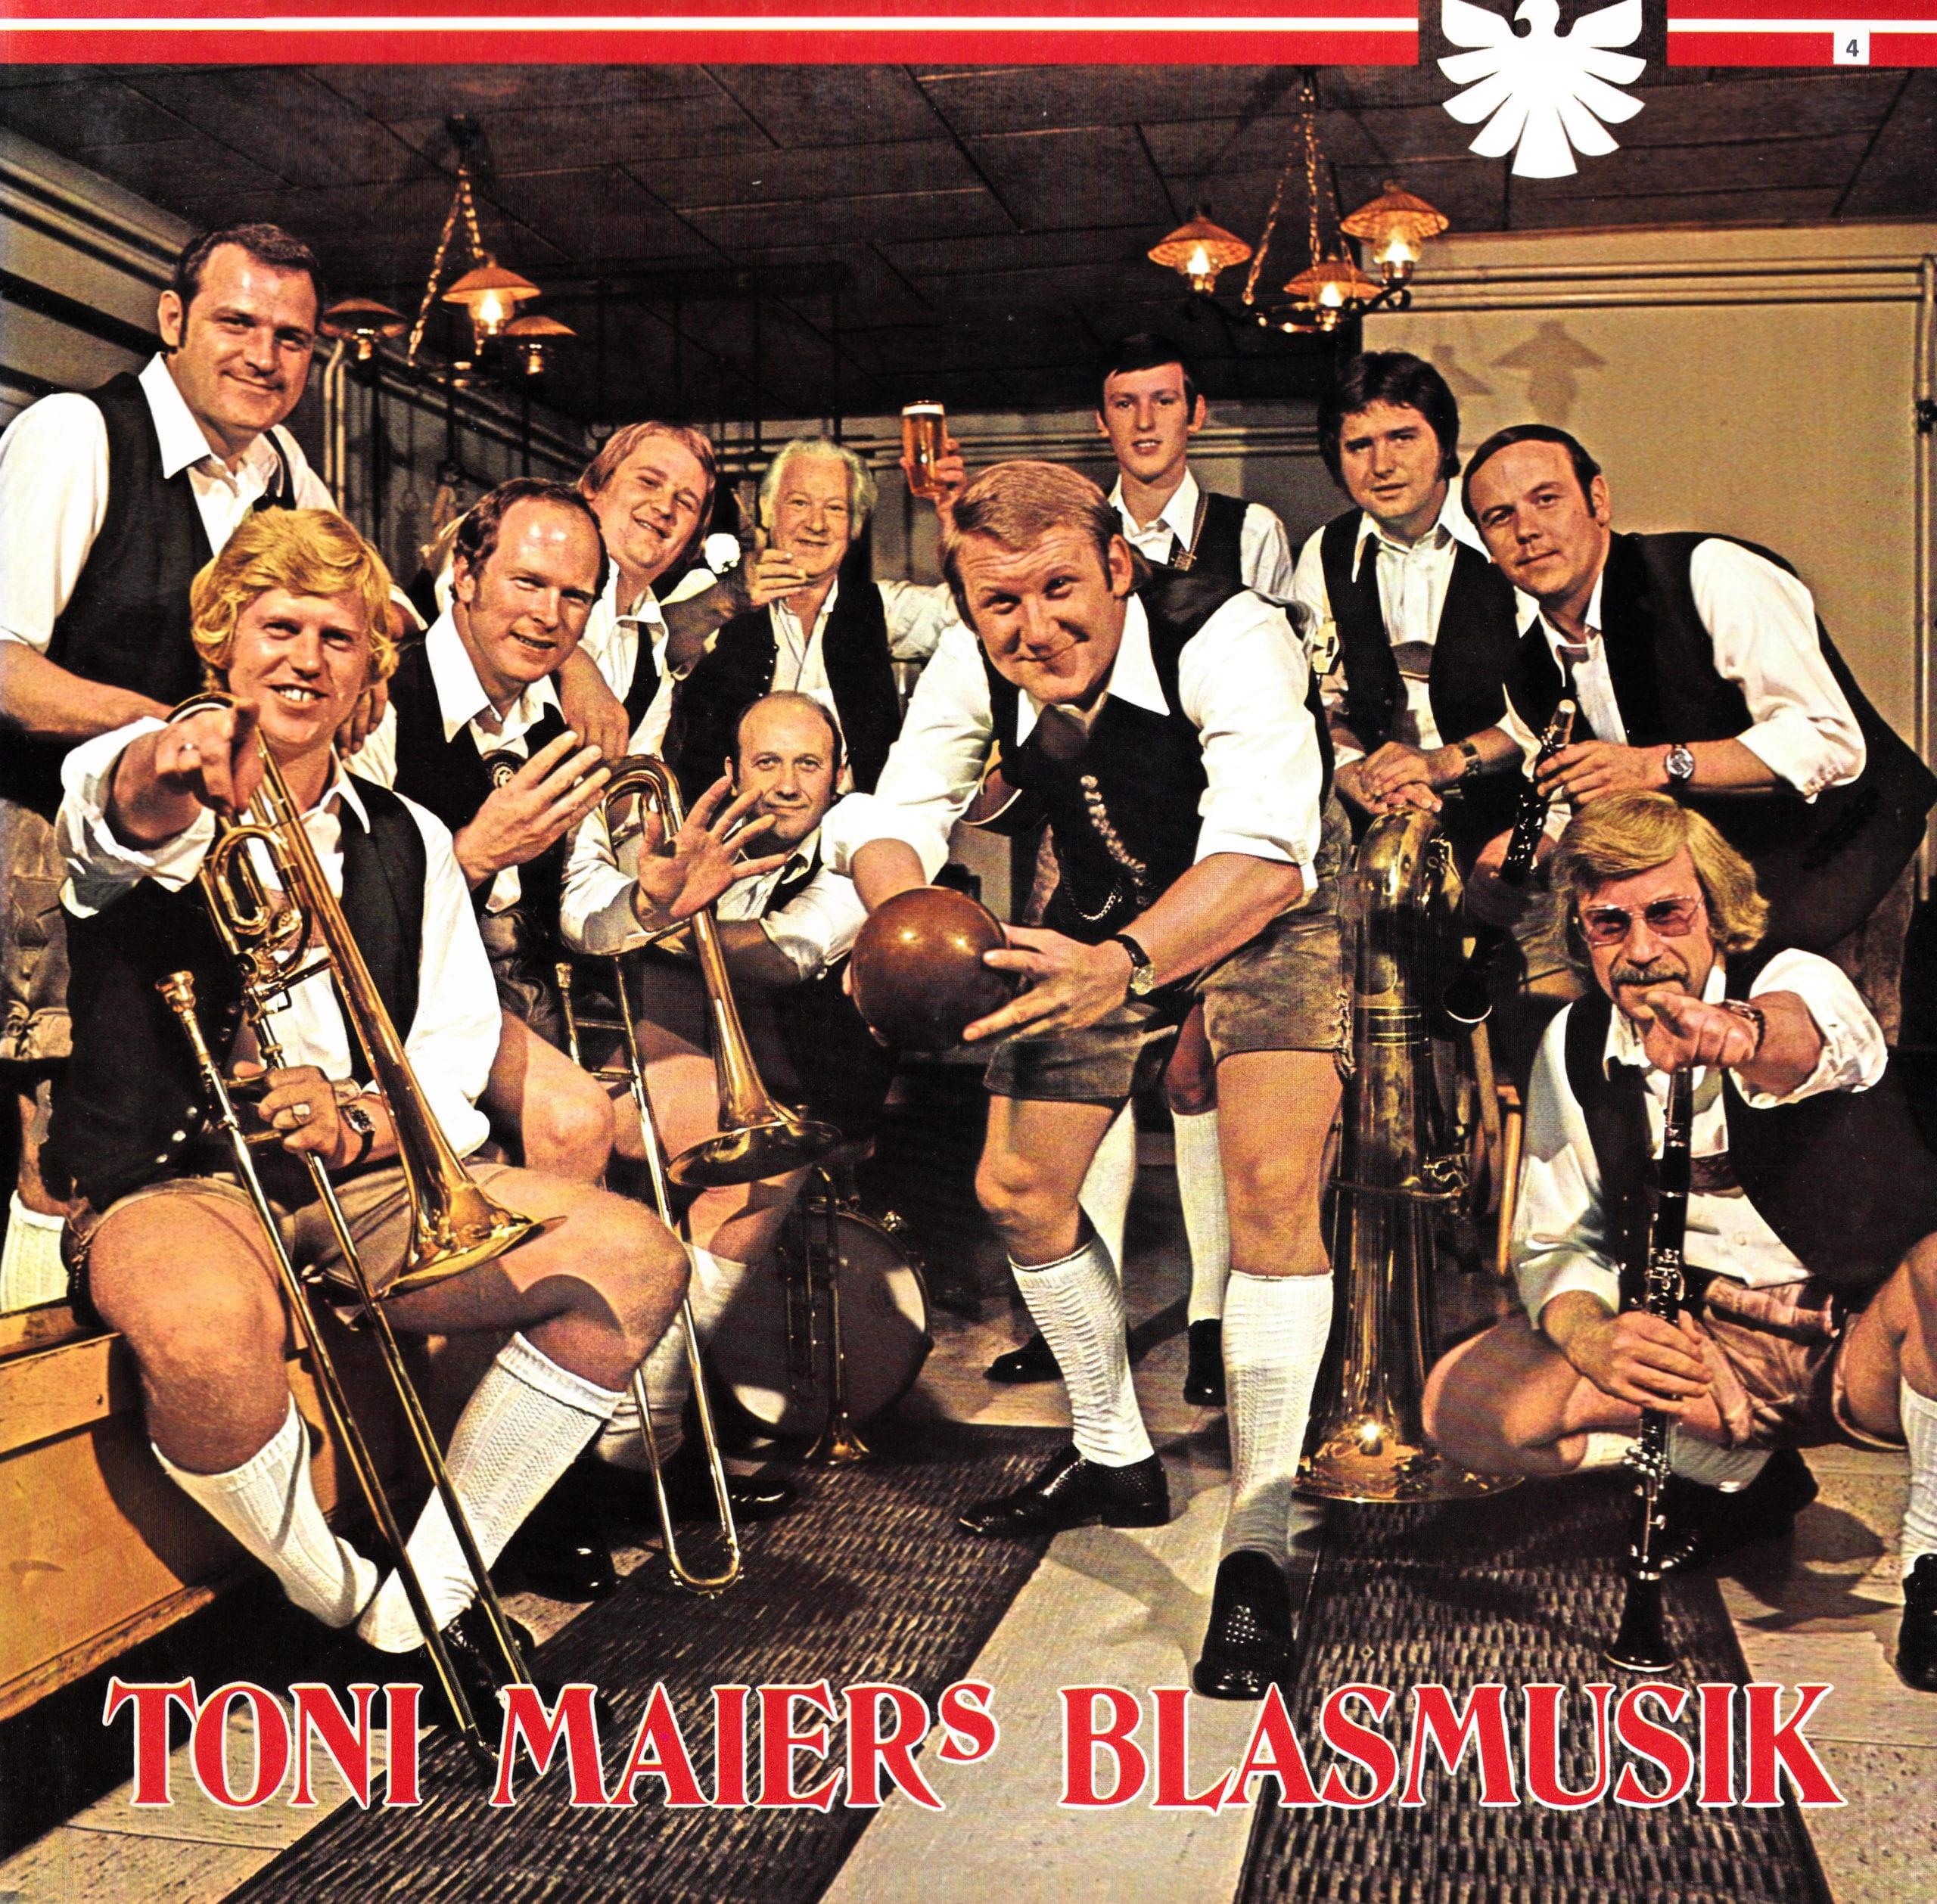 Toni Maiers Blasmusik – 1